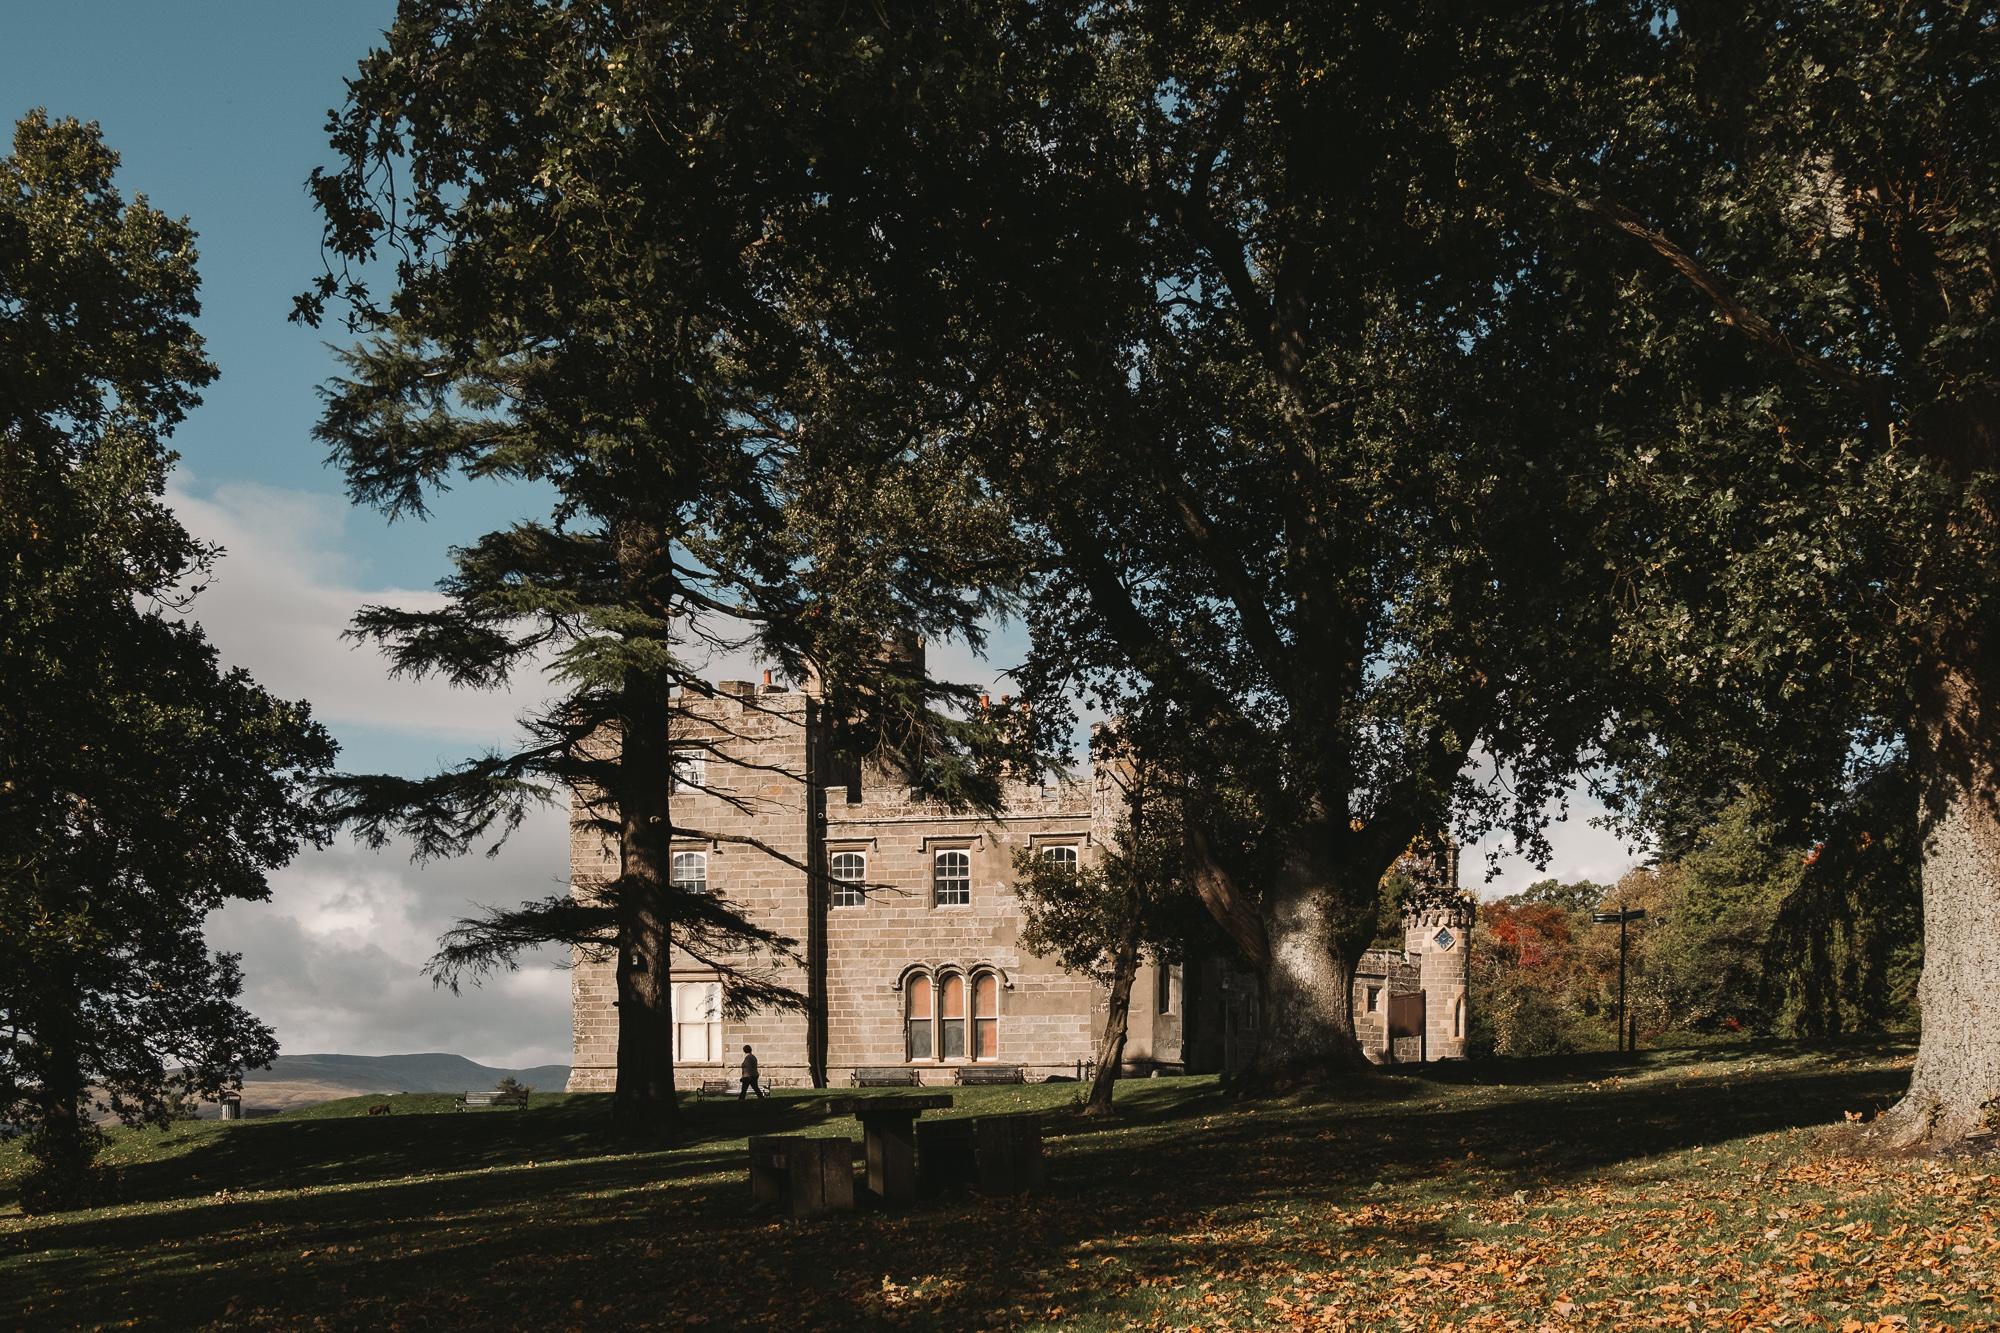 Balloch-castle-country-park-scotland-31.jpg